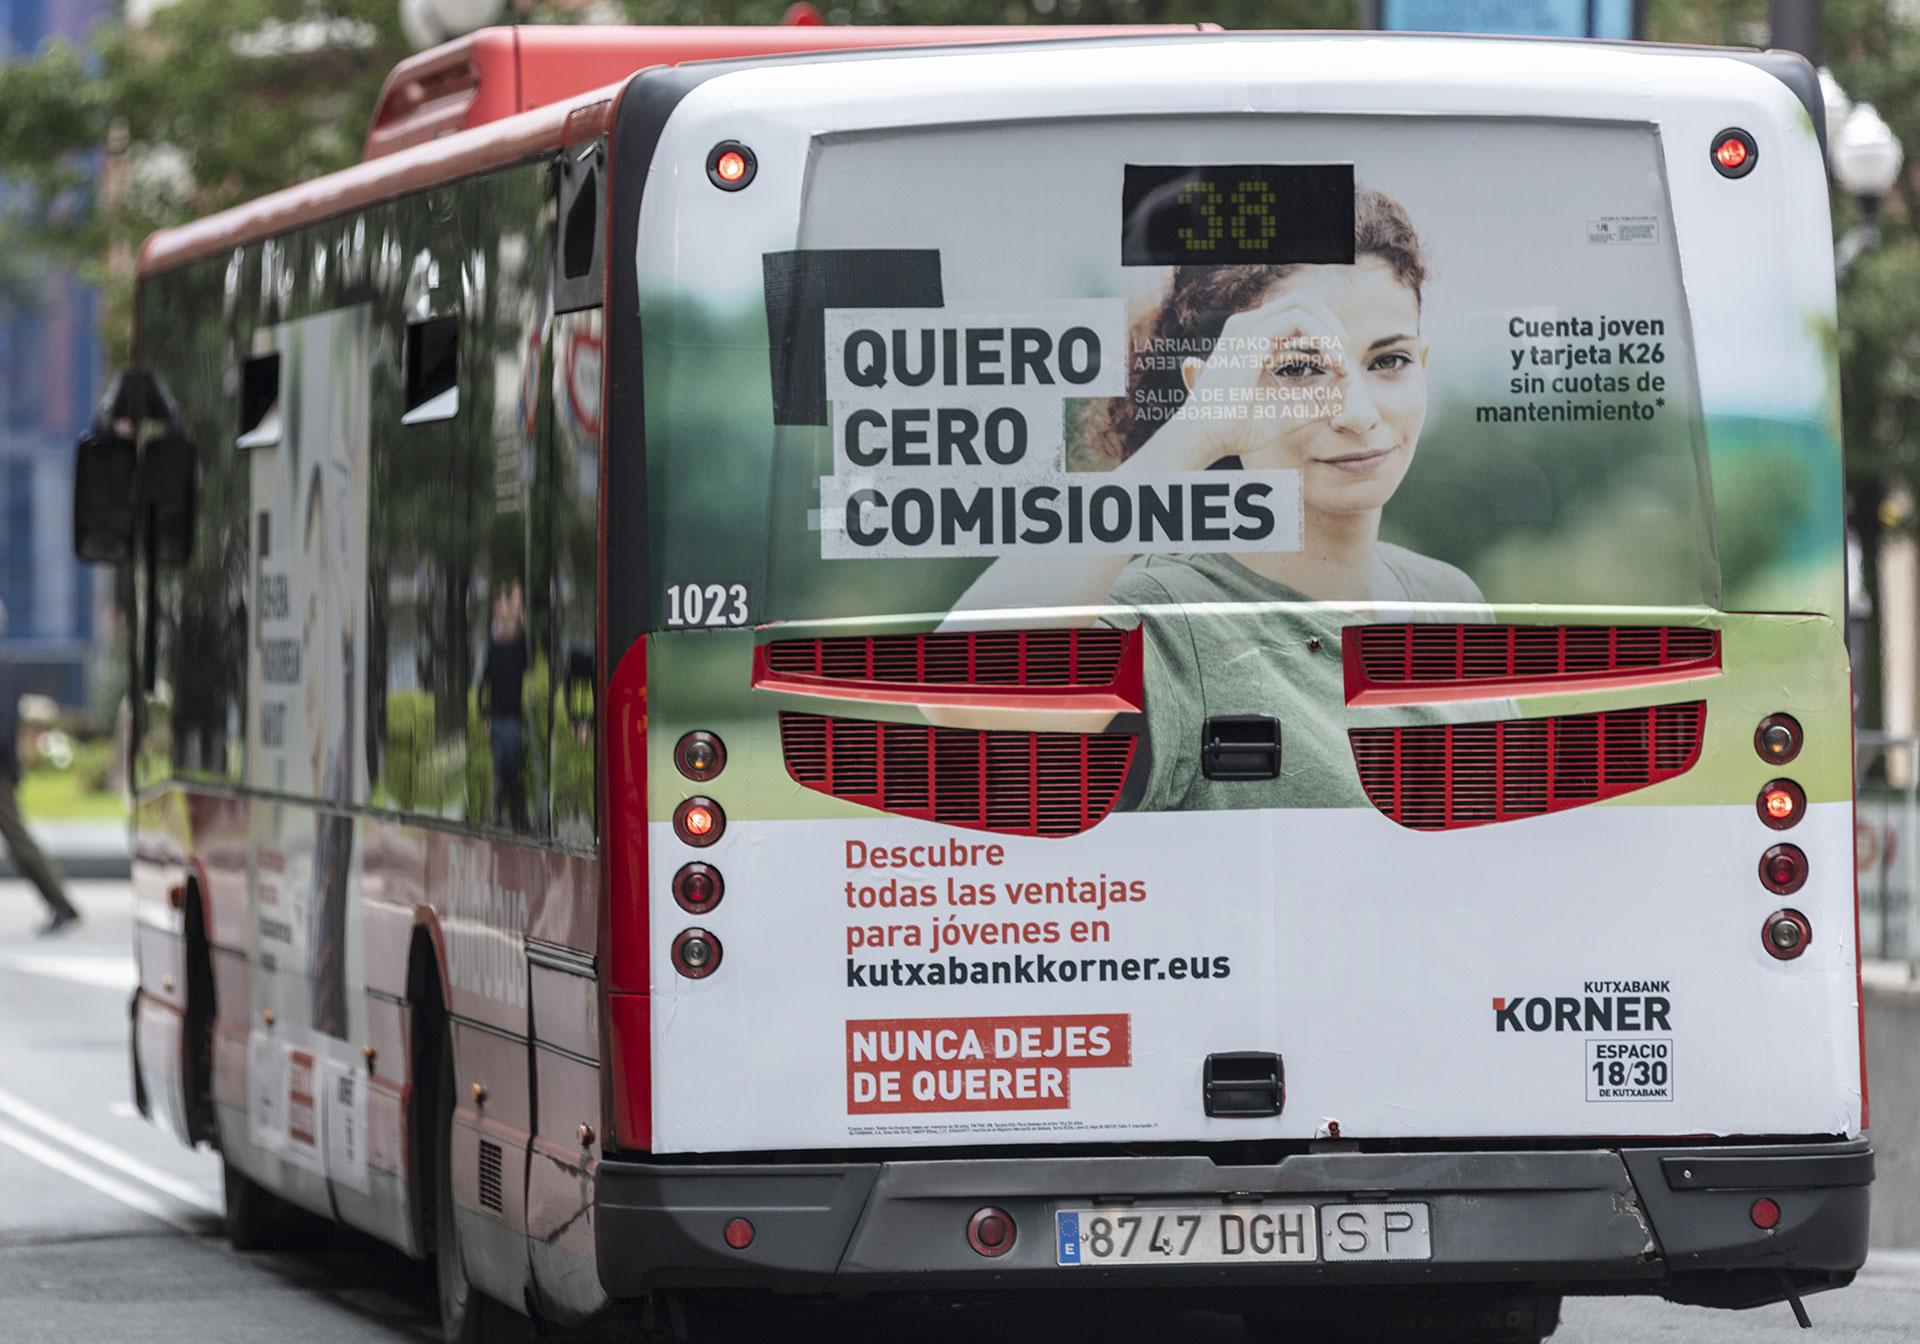 Kutxabank korner Bilbao Bilbobus parte trasera campaña móvil